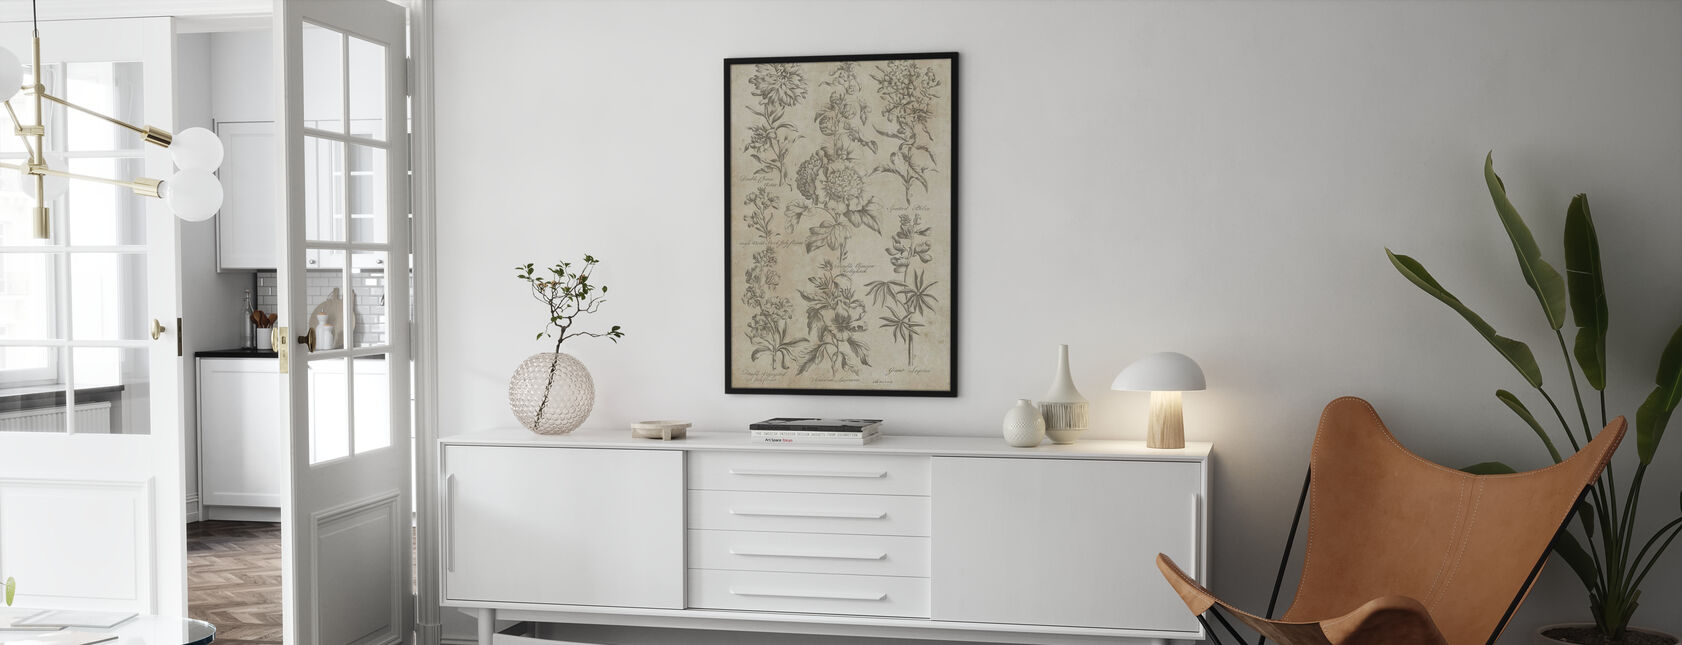 Eden Antique Bookplate - Poster - Living Room